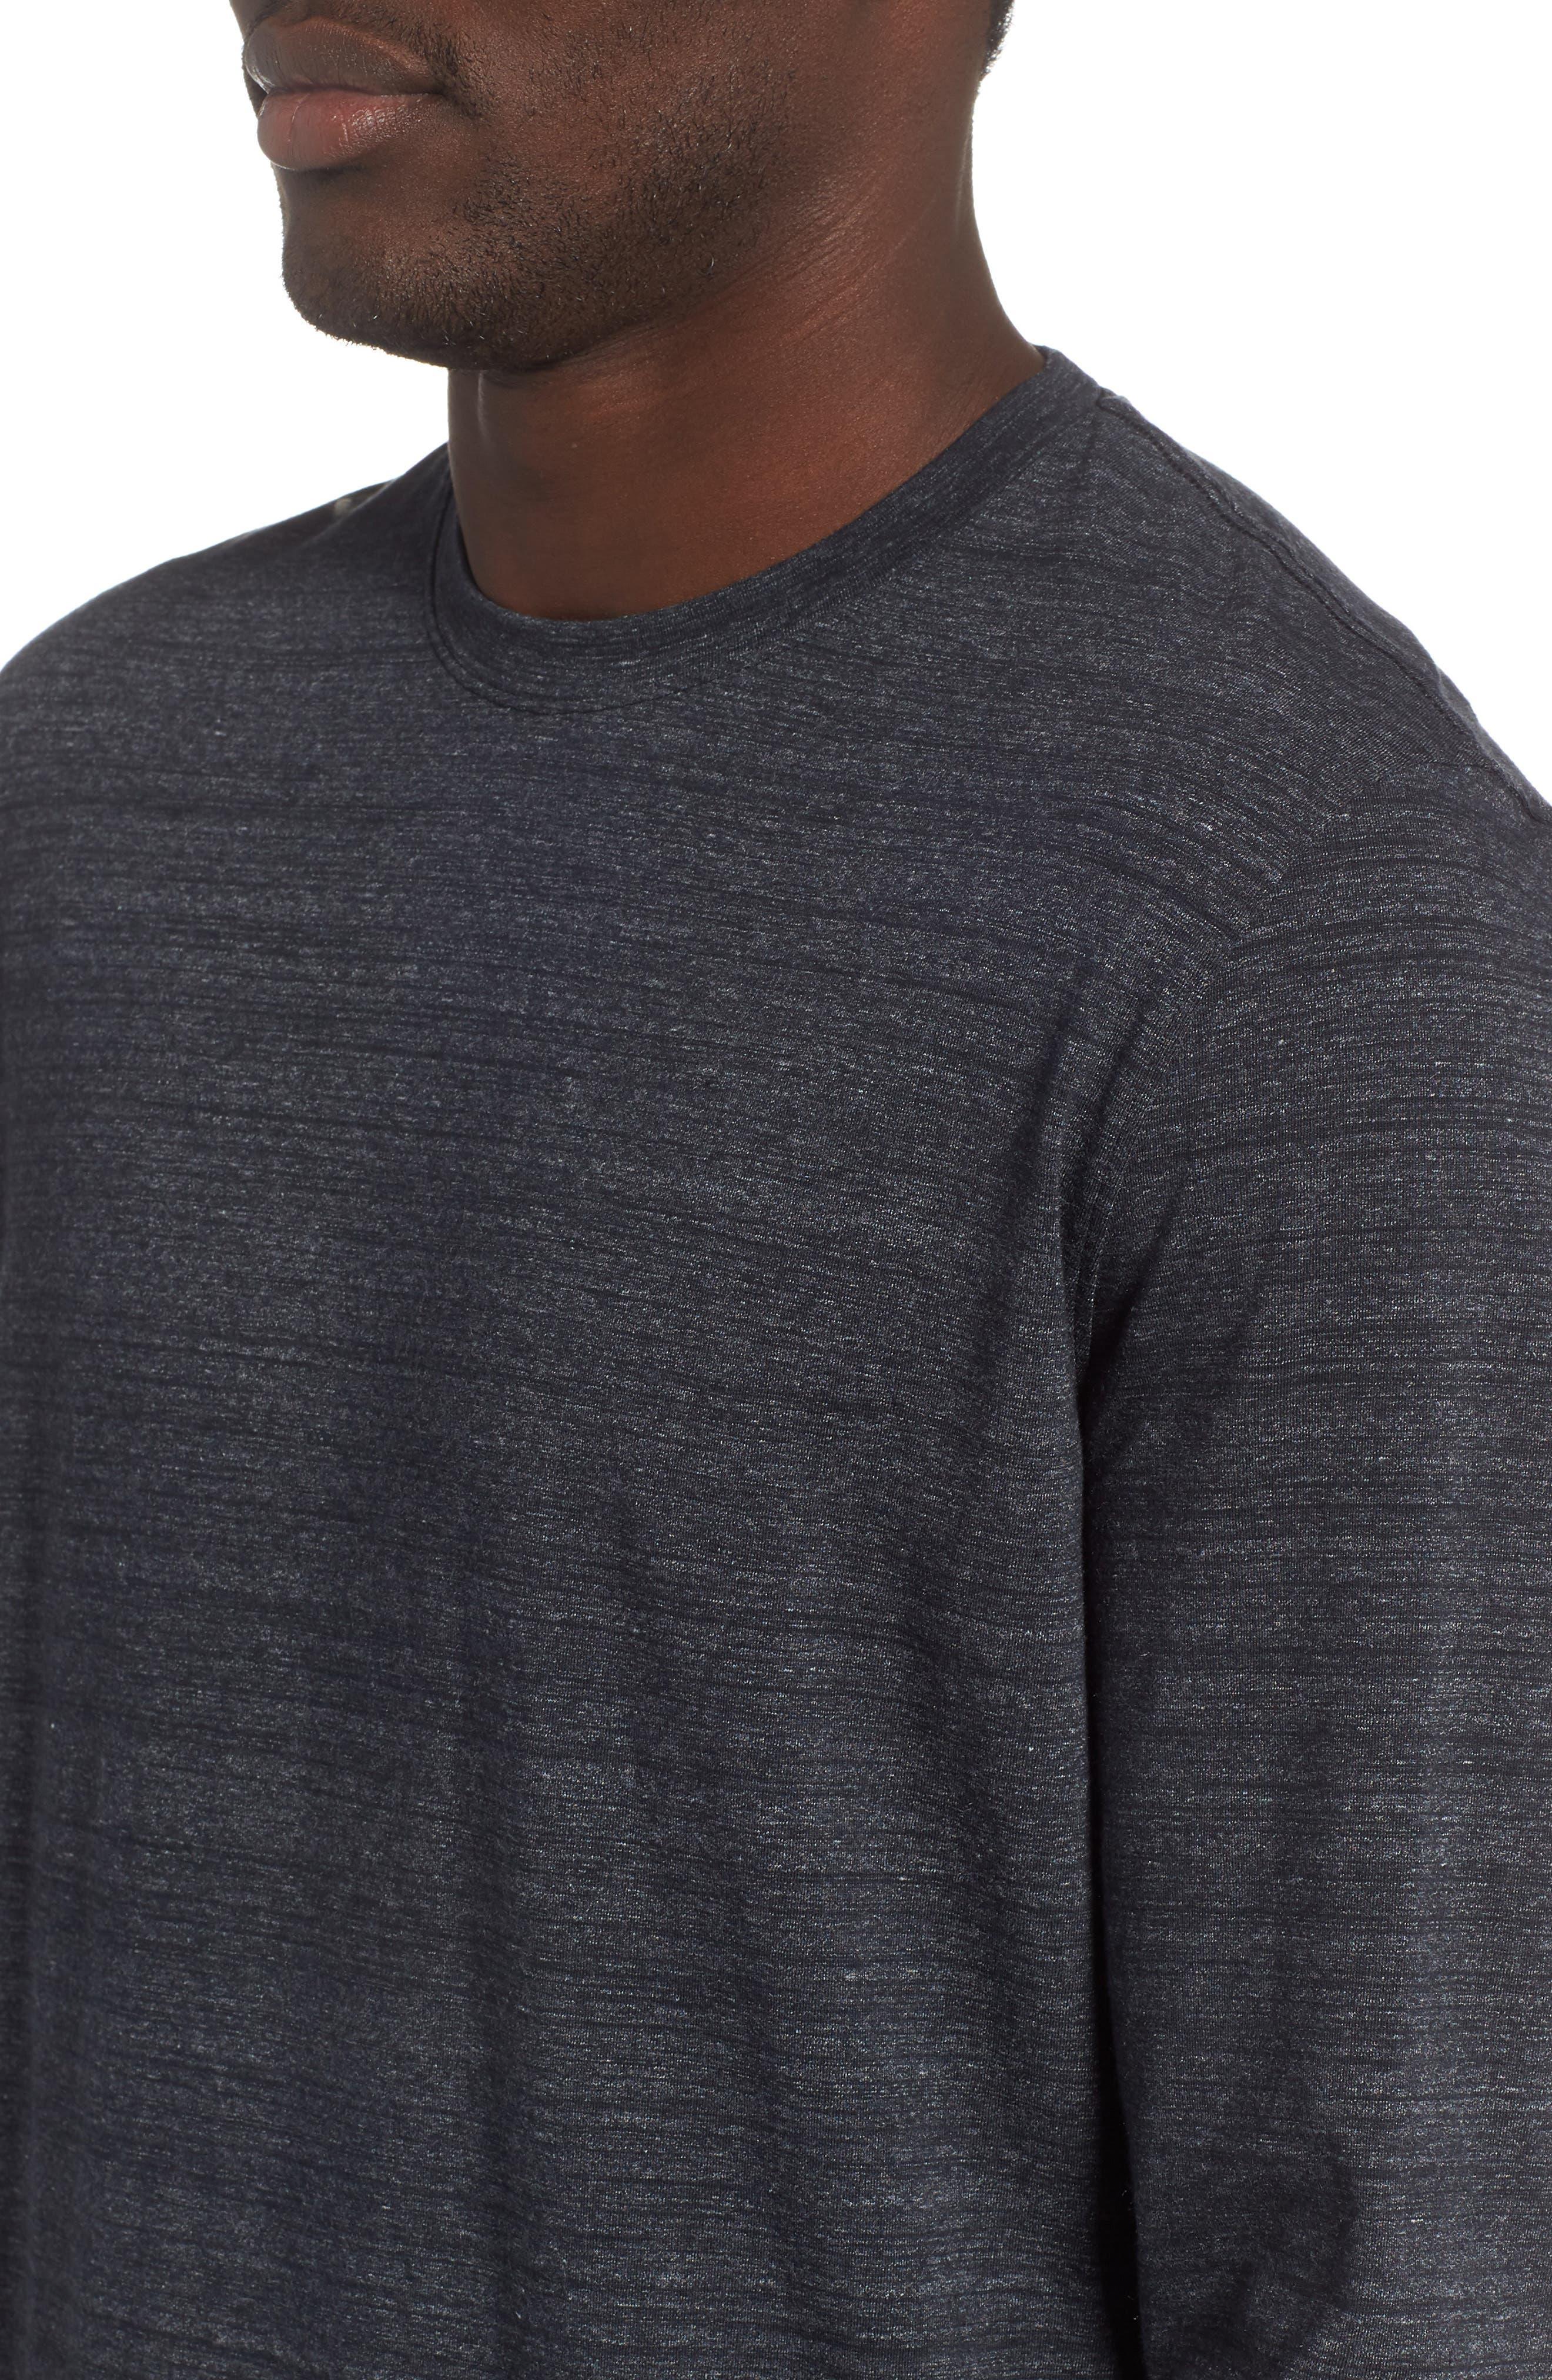 Sportstyle Long Sleeve Performance T-Shirt,                             Alternate thumbnail 4, color,                             BLACK/ STEEL